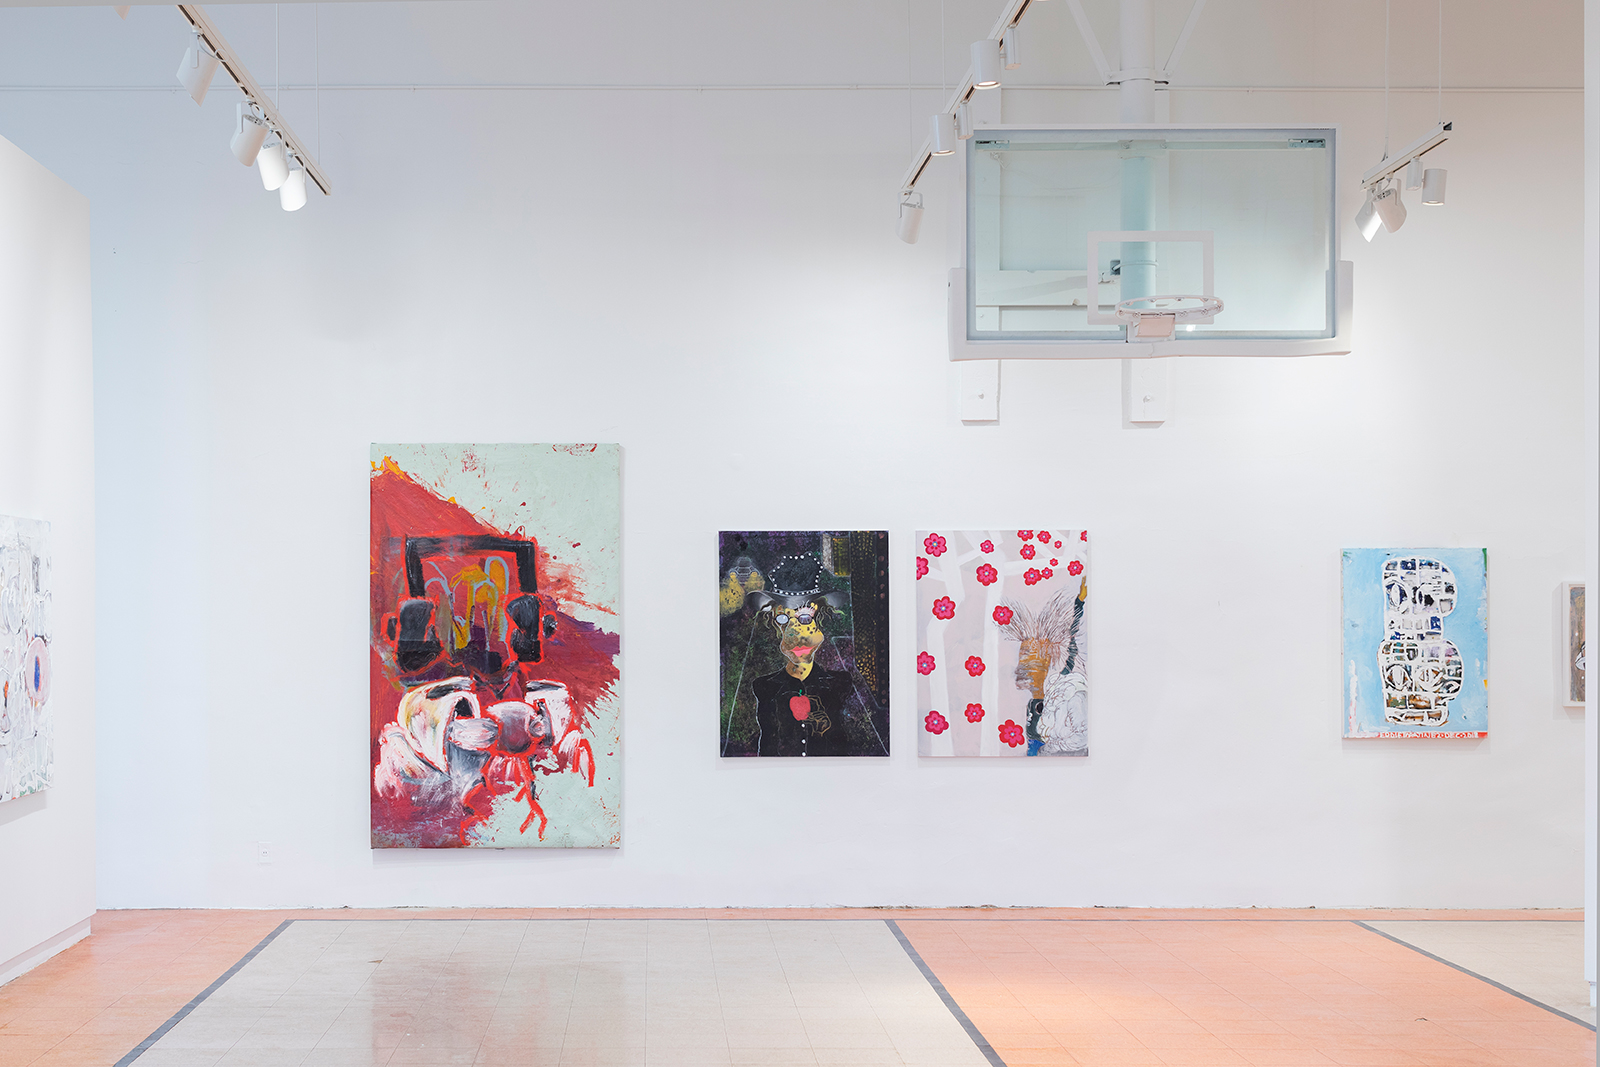 Reyes Finn gallery throws open its doors in Detroit